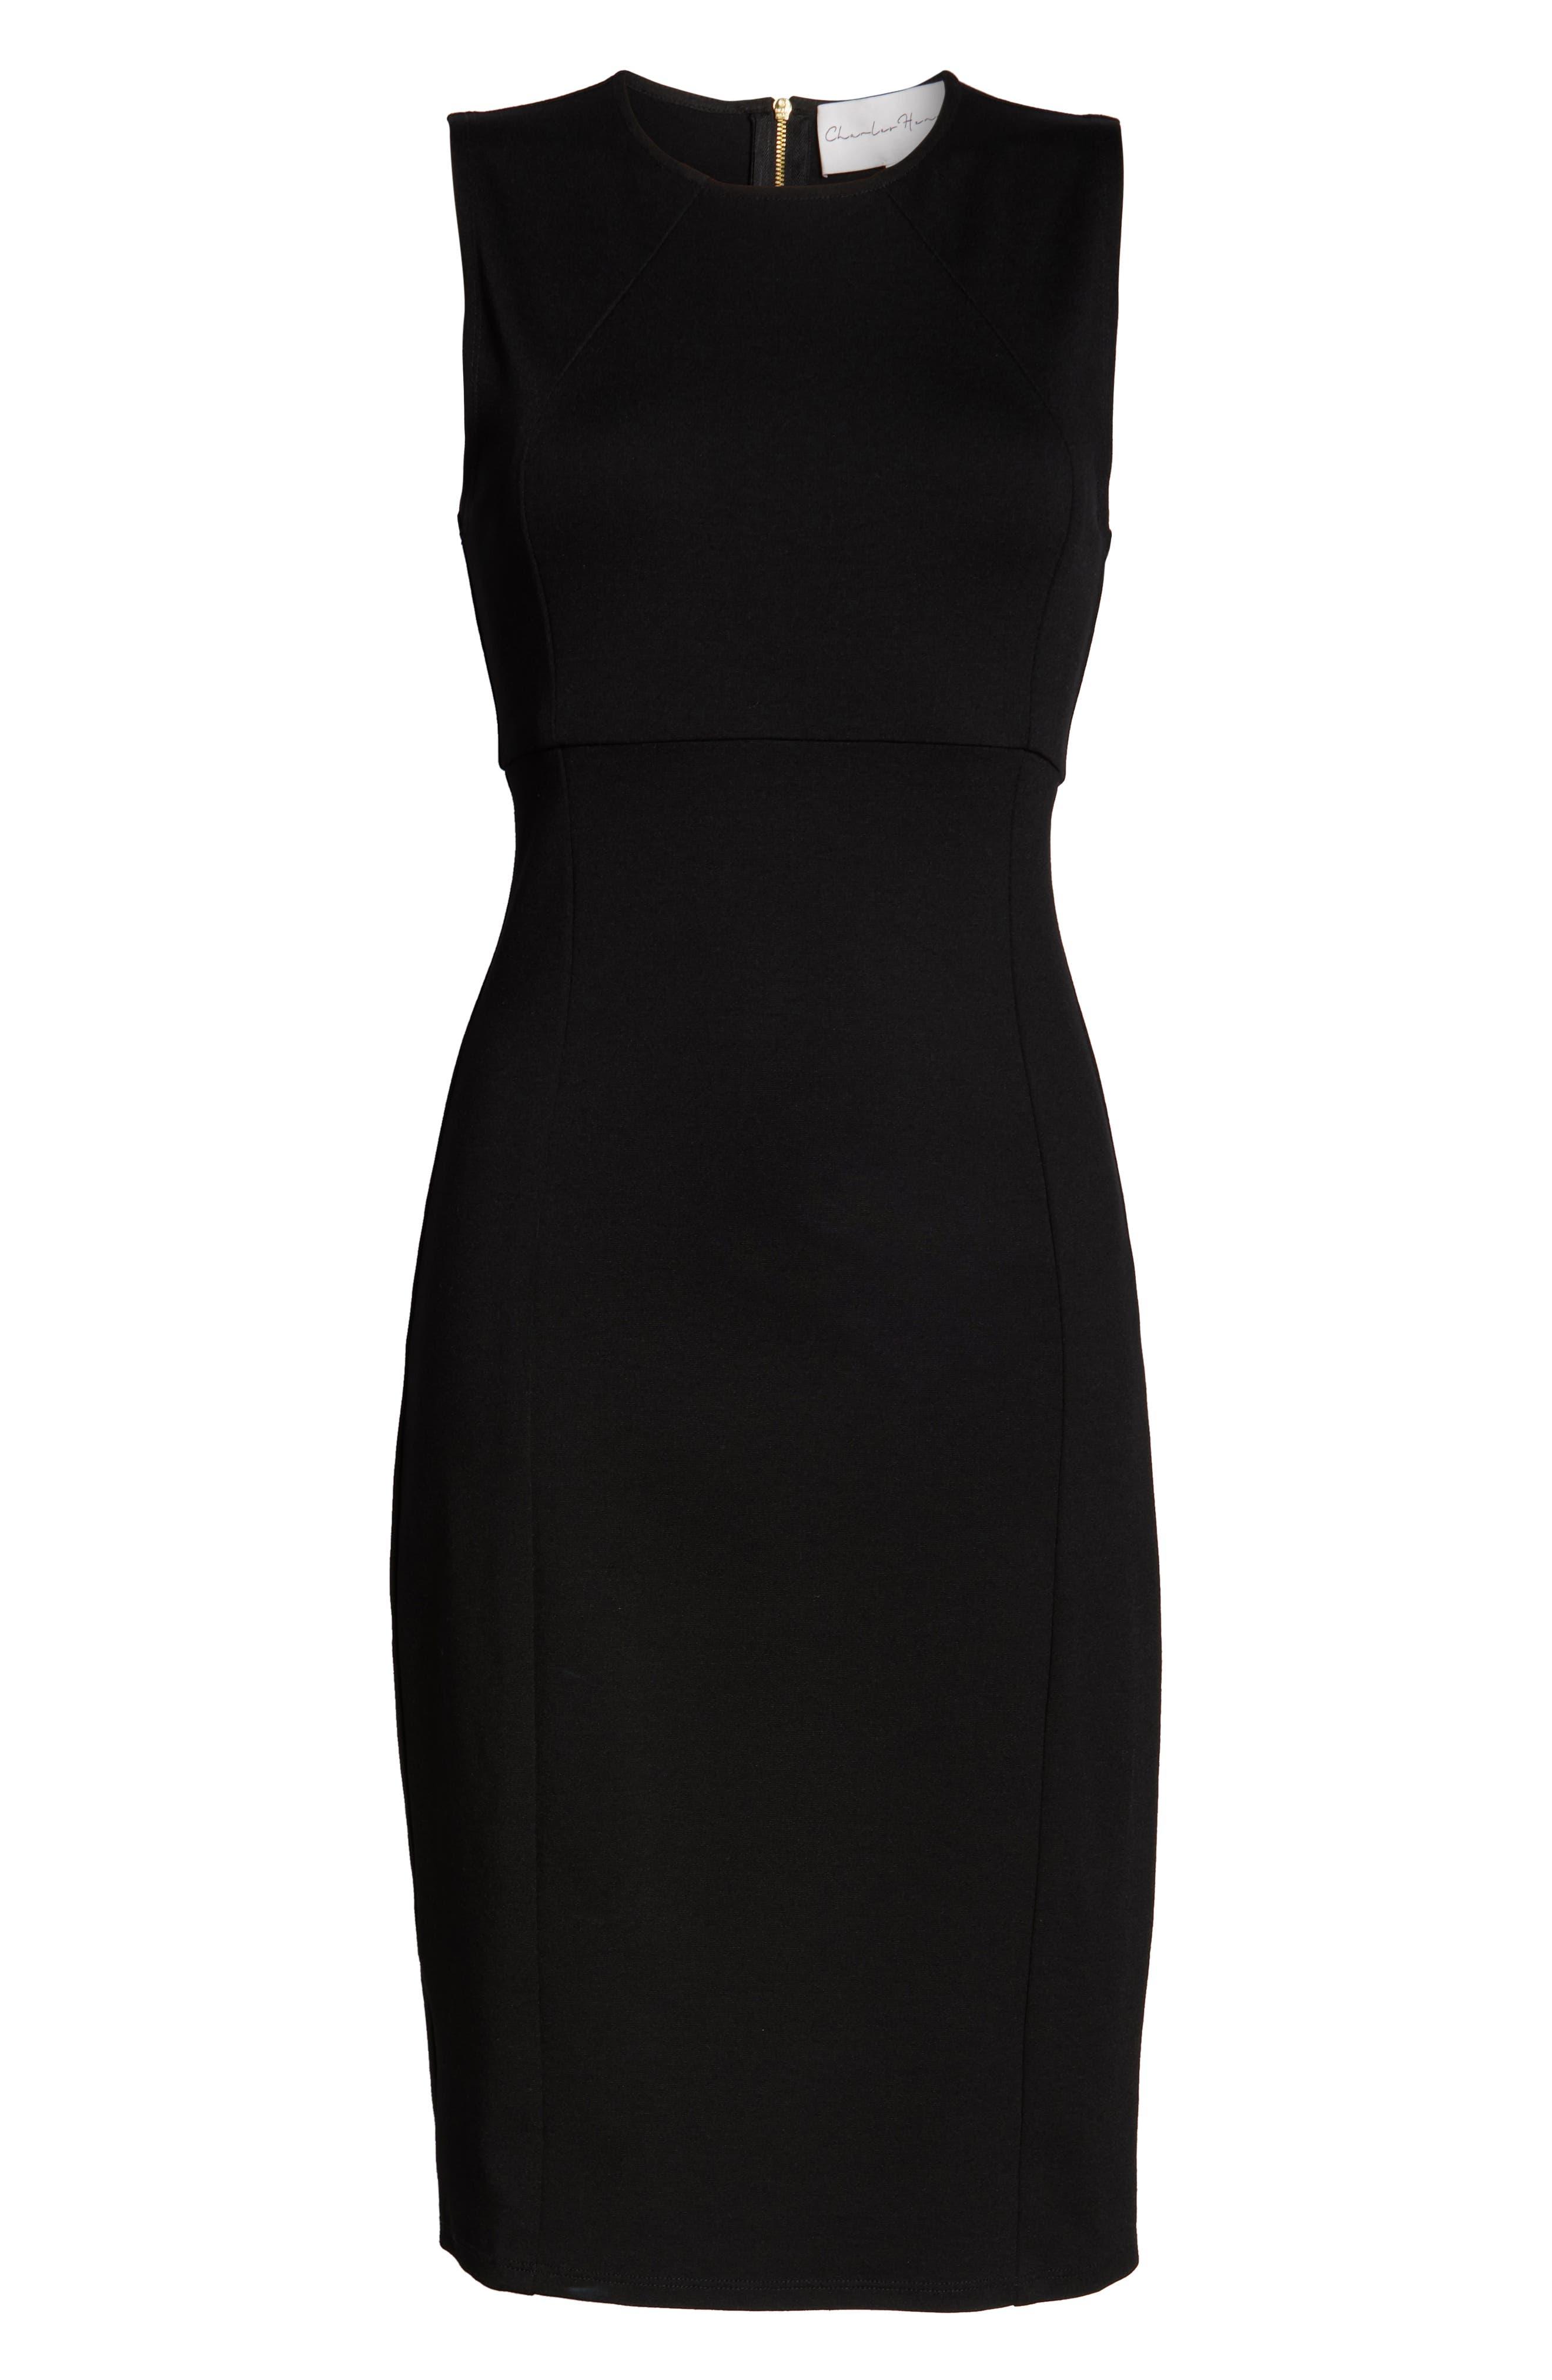 CHARLES HENRY, Sleeveless Sheath Dress, Alternate thumbnail 7, color, BLACK